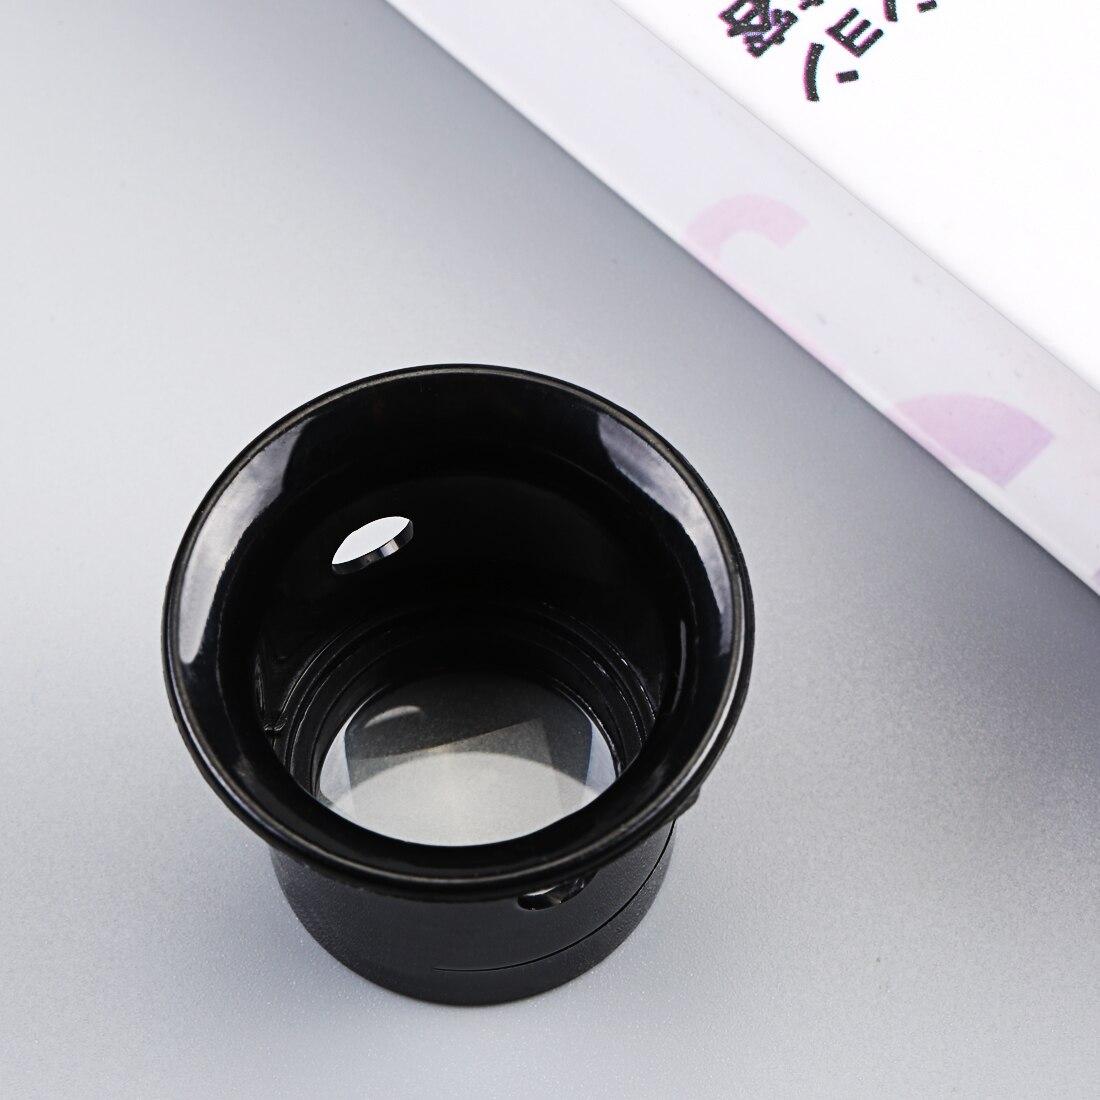 Jeweler Watch Magnifier Tool 10X 5X Monocular Magnifying Glass Loupe Lens Eye Magnifier Len Repair Kit Jeweler Watch Magnifier Tool 10X/5X Monocular Magnifying Glass Loupe Lens Eye Magnifier Len Repair Kit Tool